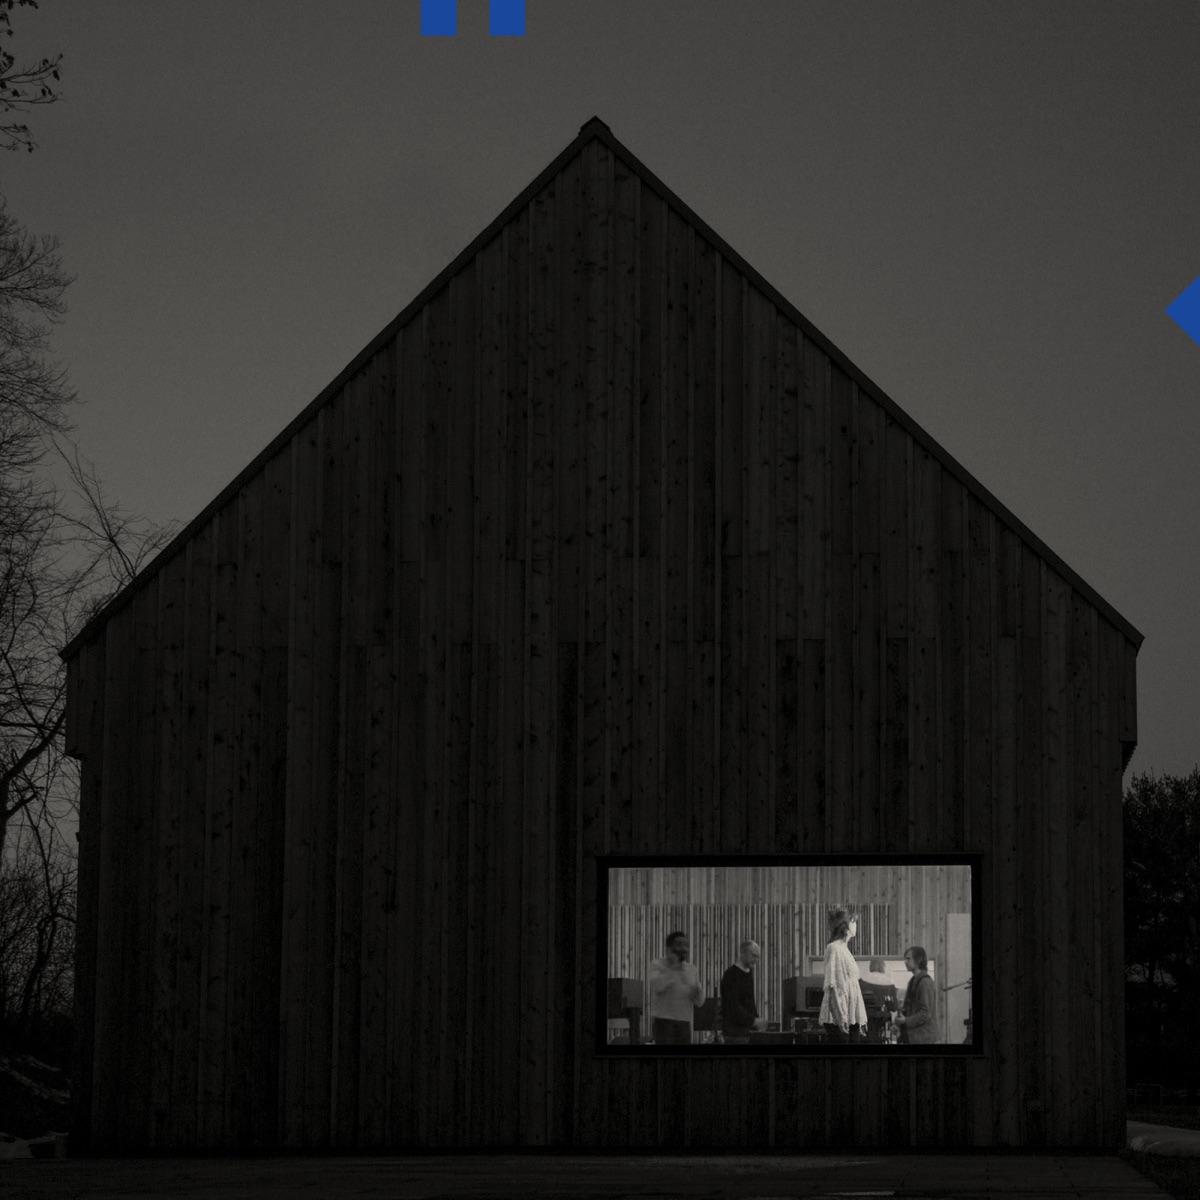 Sleep Well Beast The National CD cover